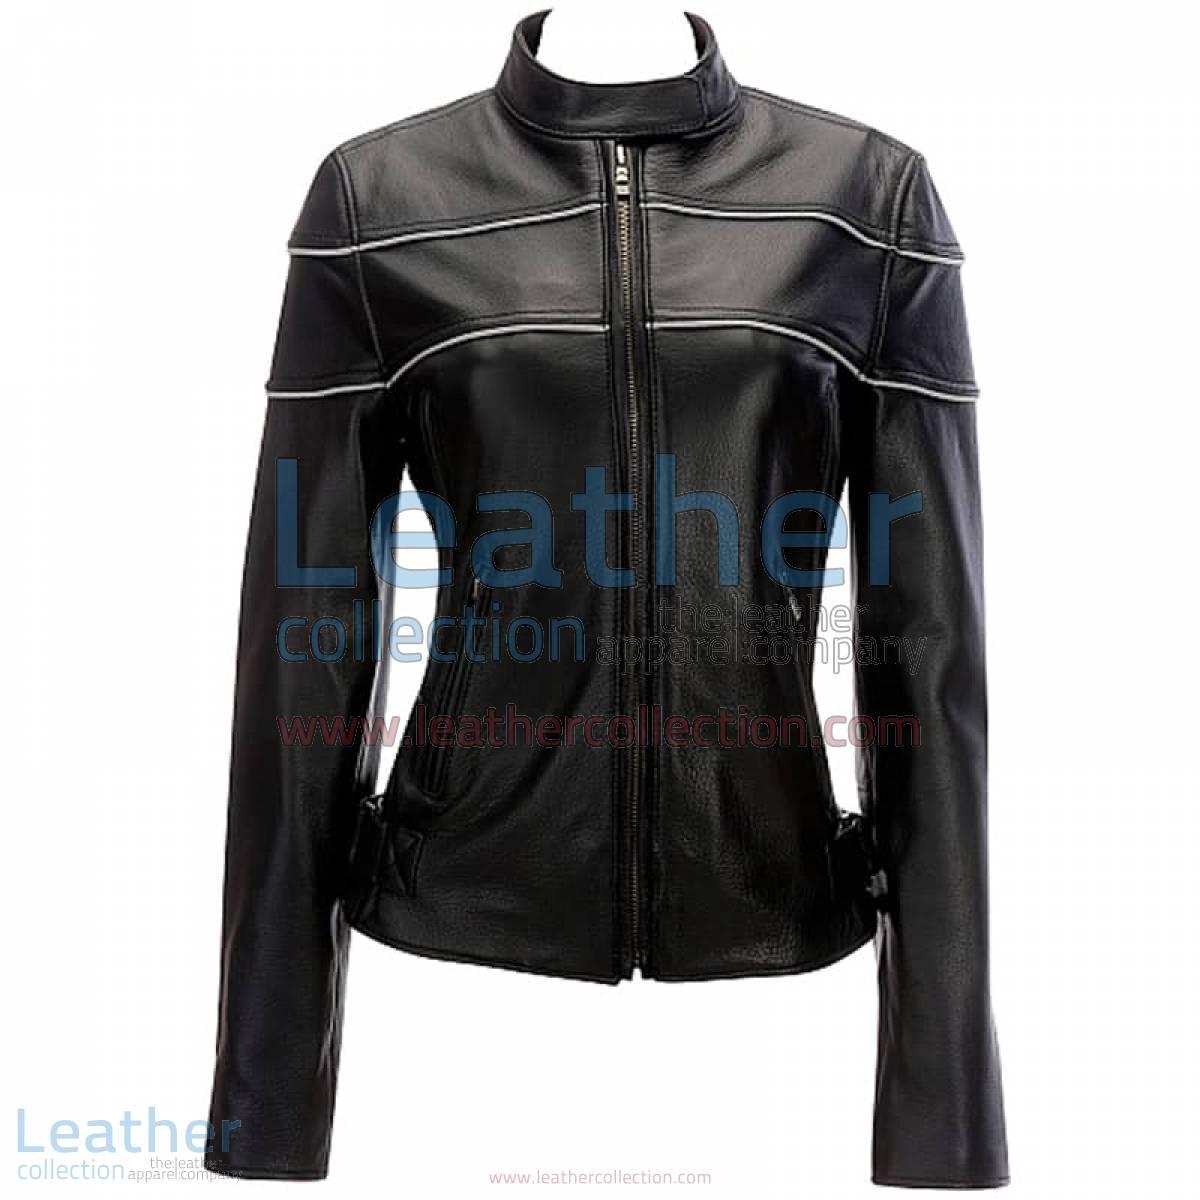 Leather Reflective Piping Jacket Black | piping jacket